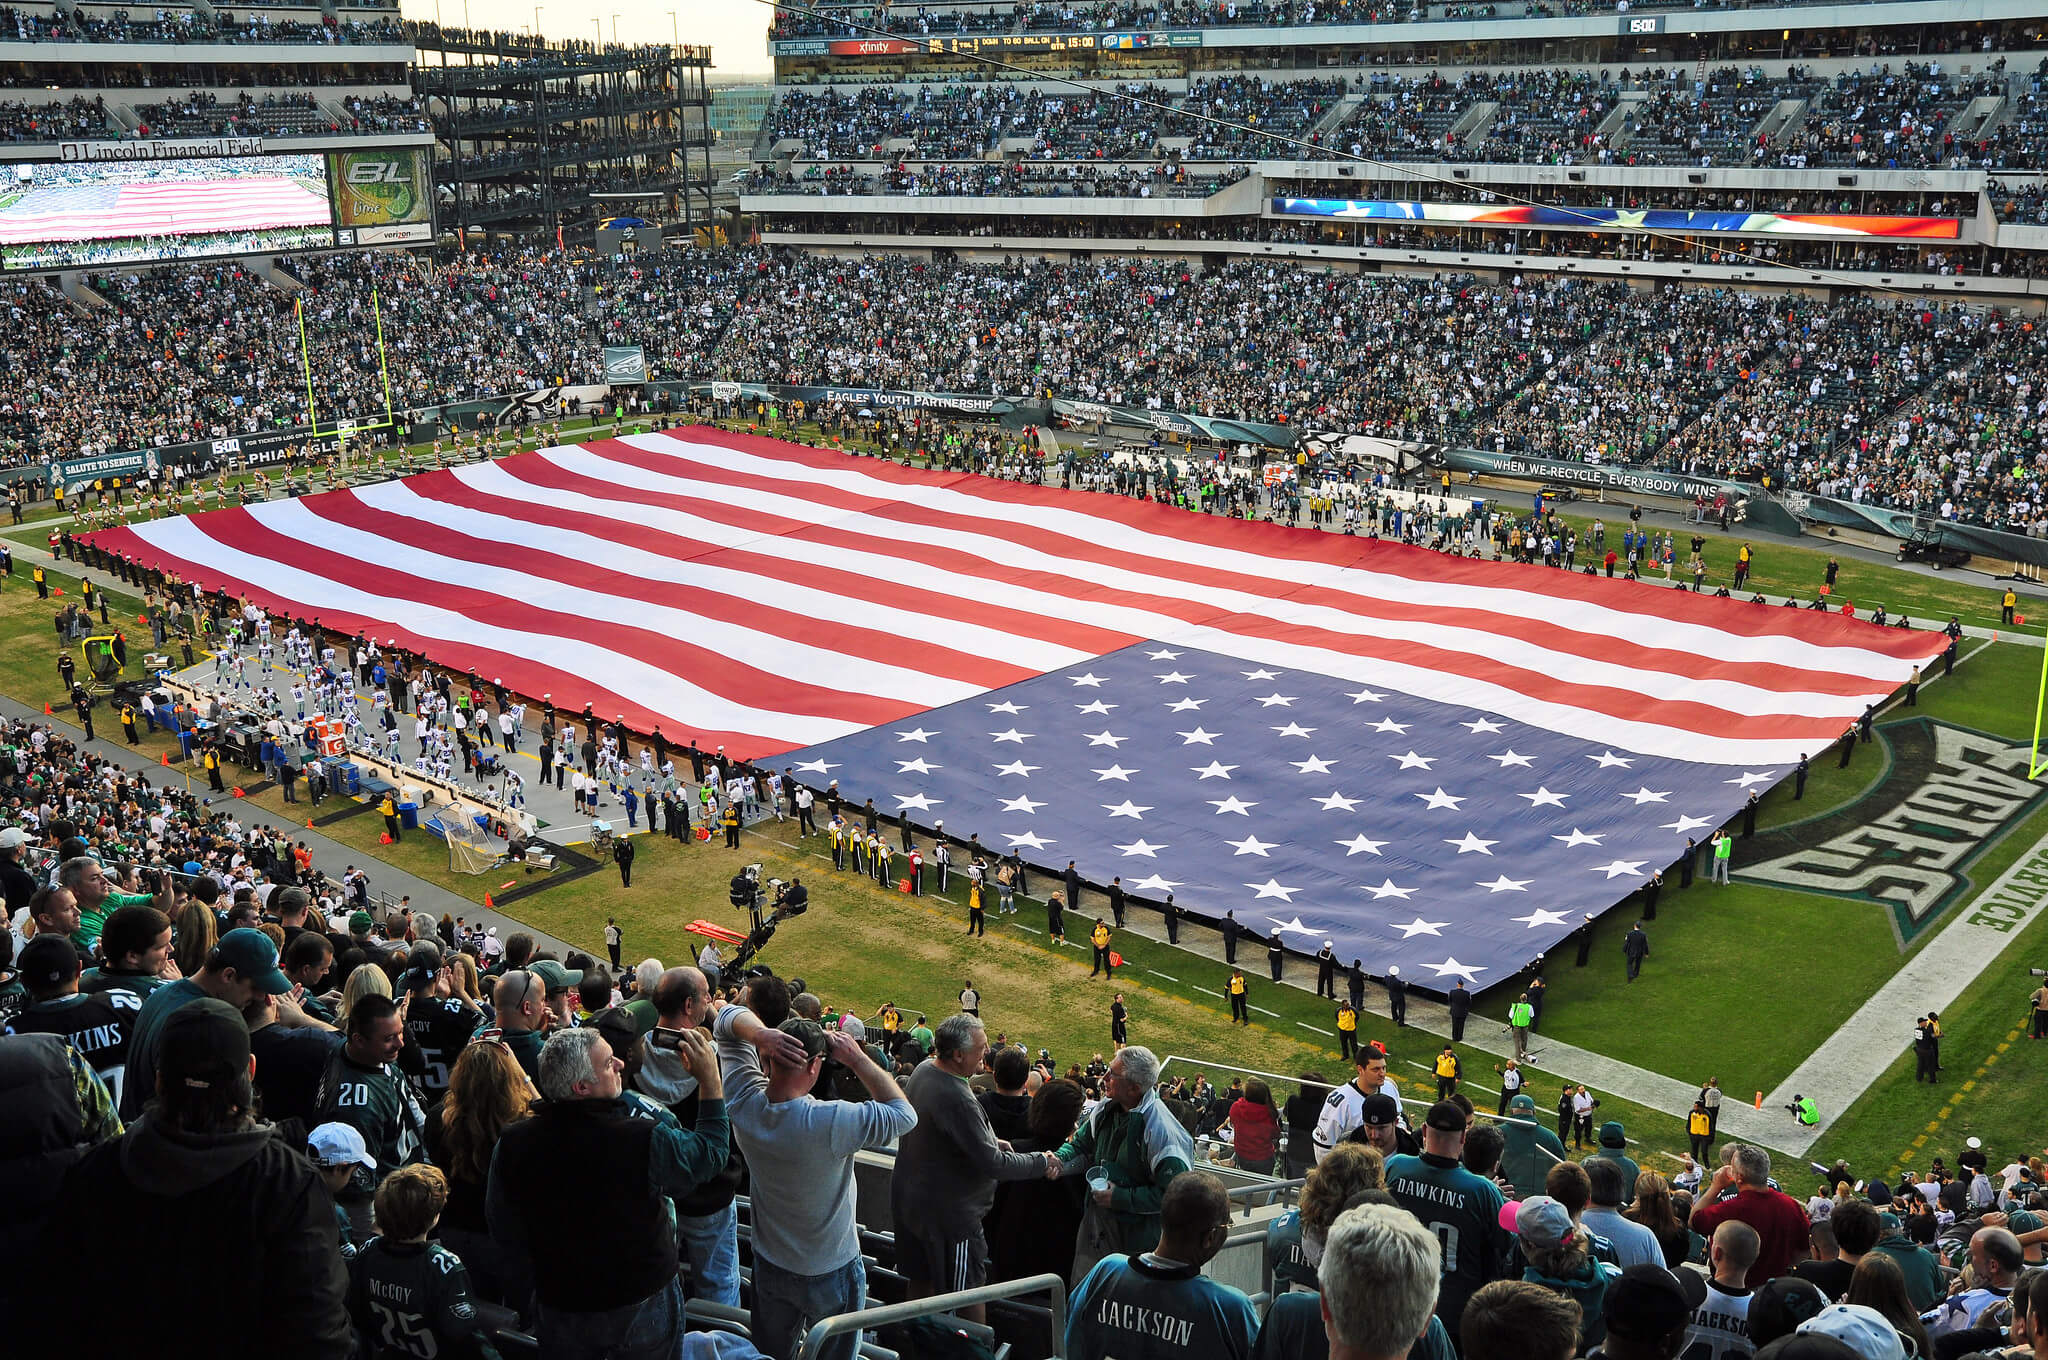 Philadelphia Eagles fans